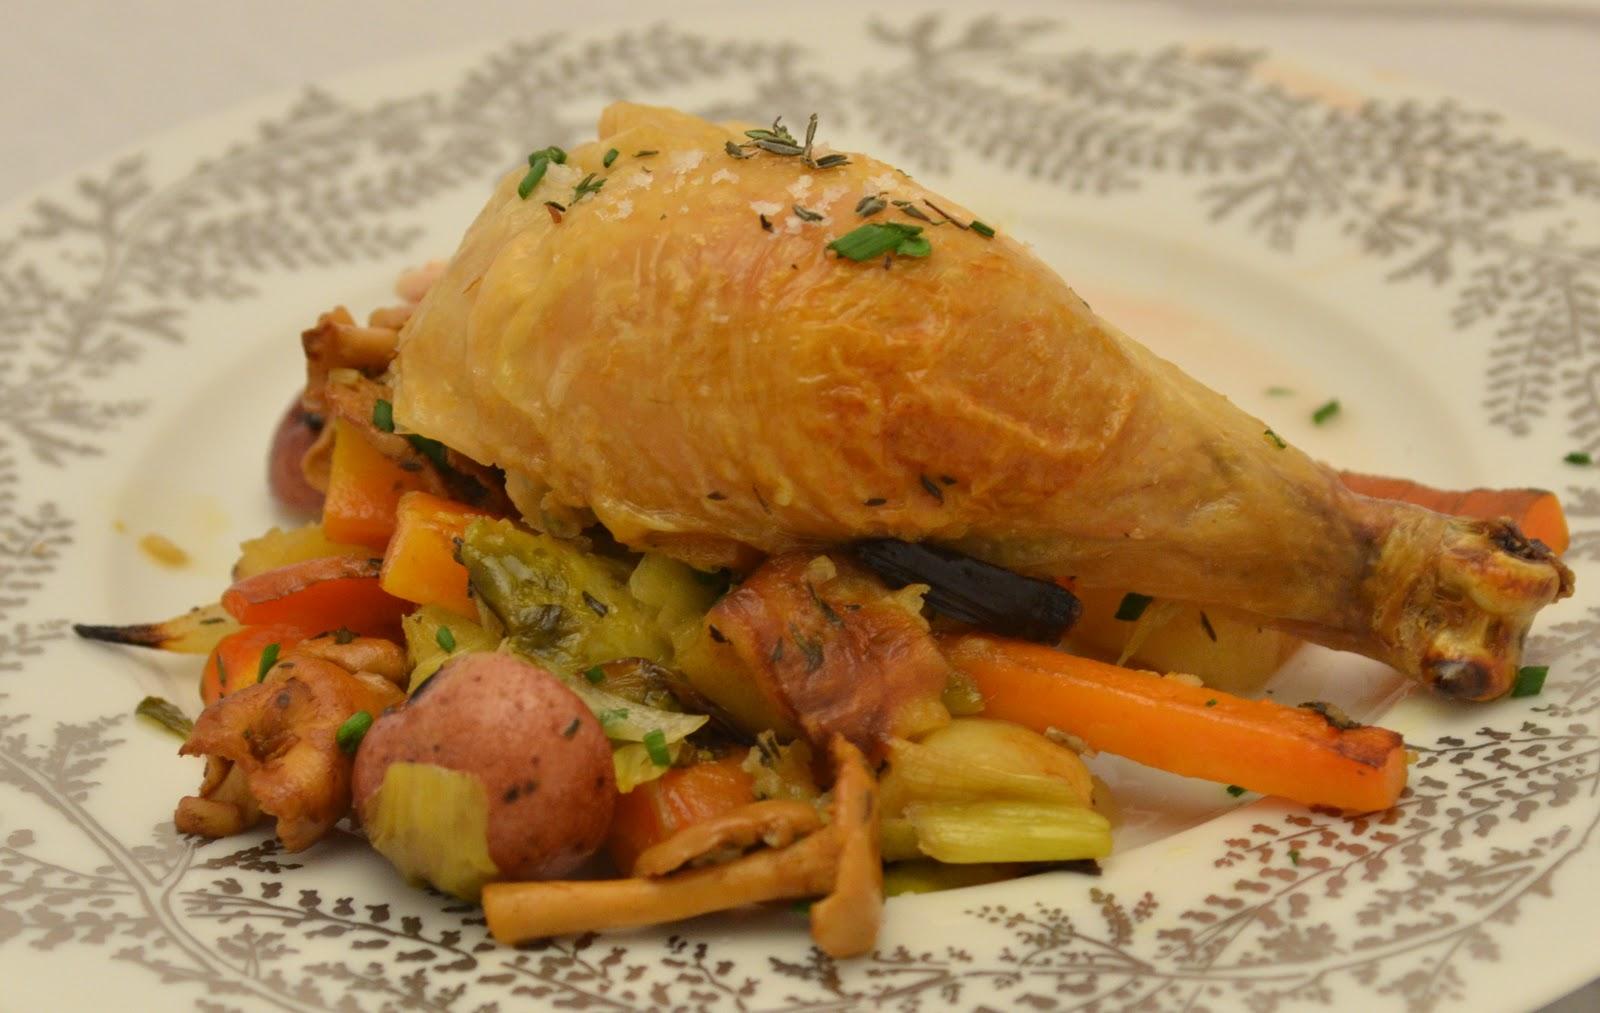 Navy Blue Kitchen: Thomas Keller's Roasted Chicken